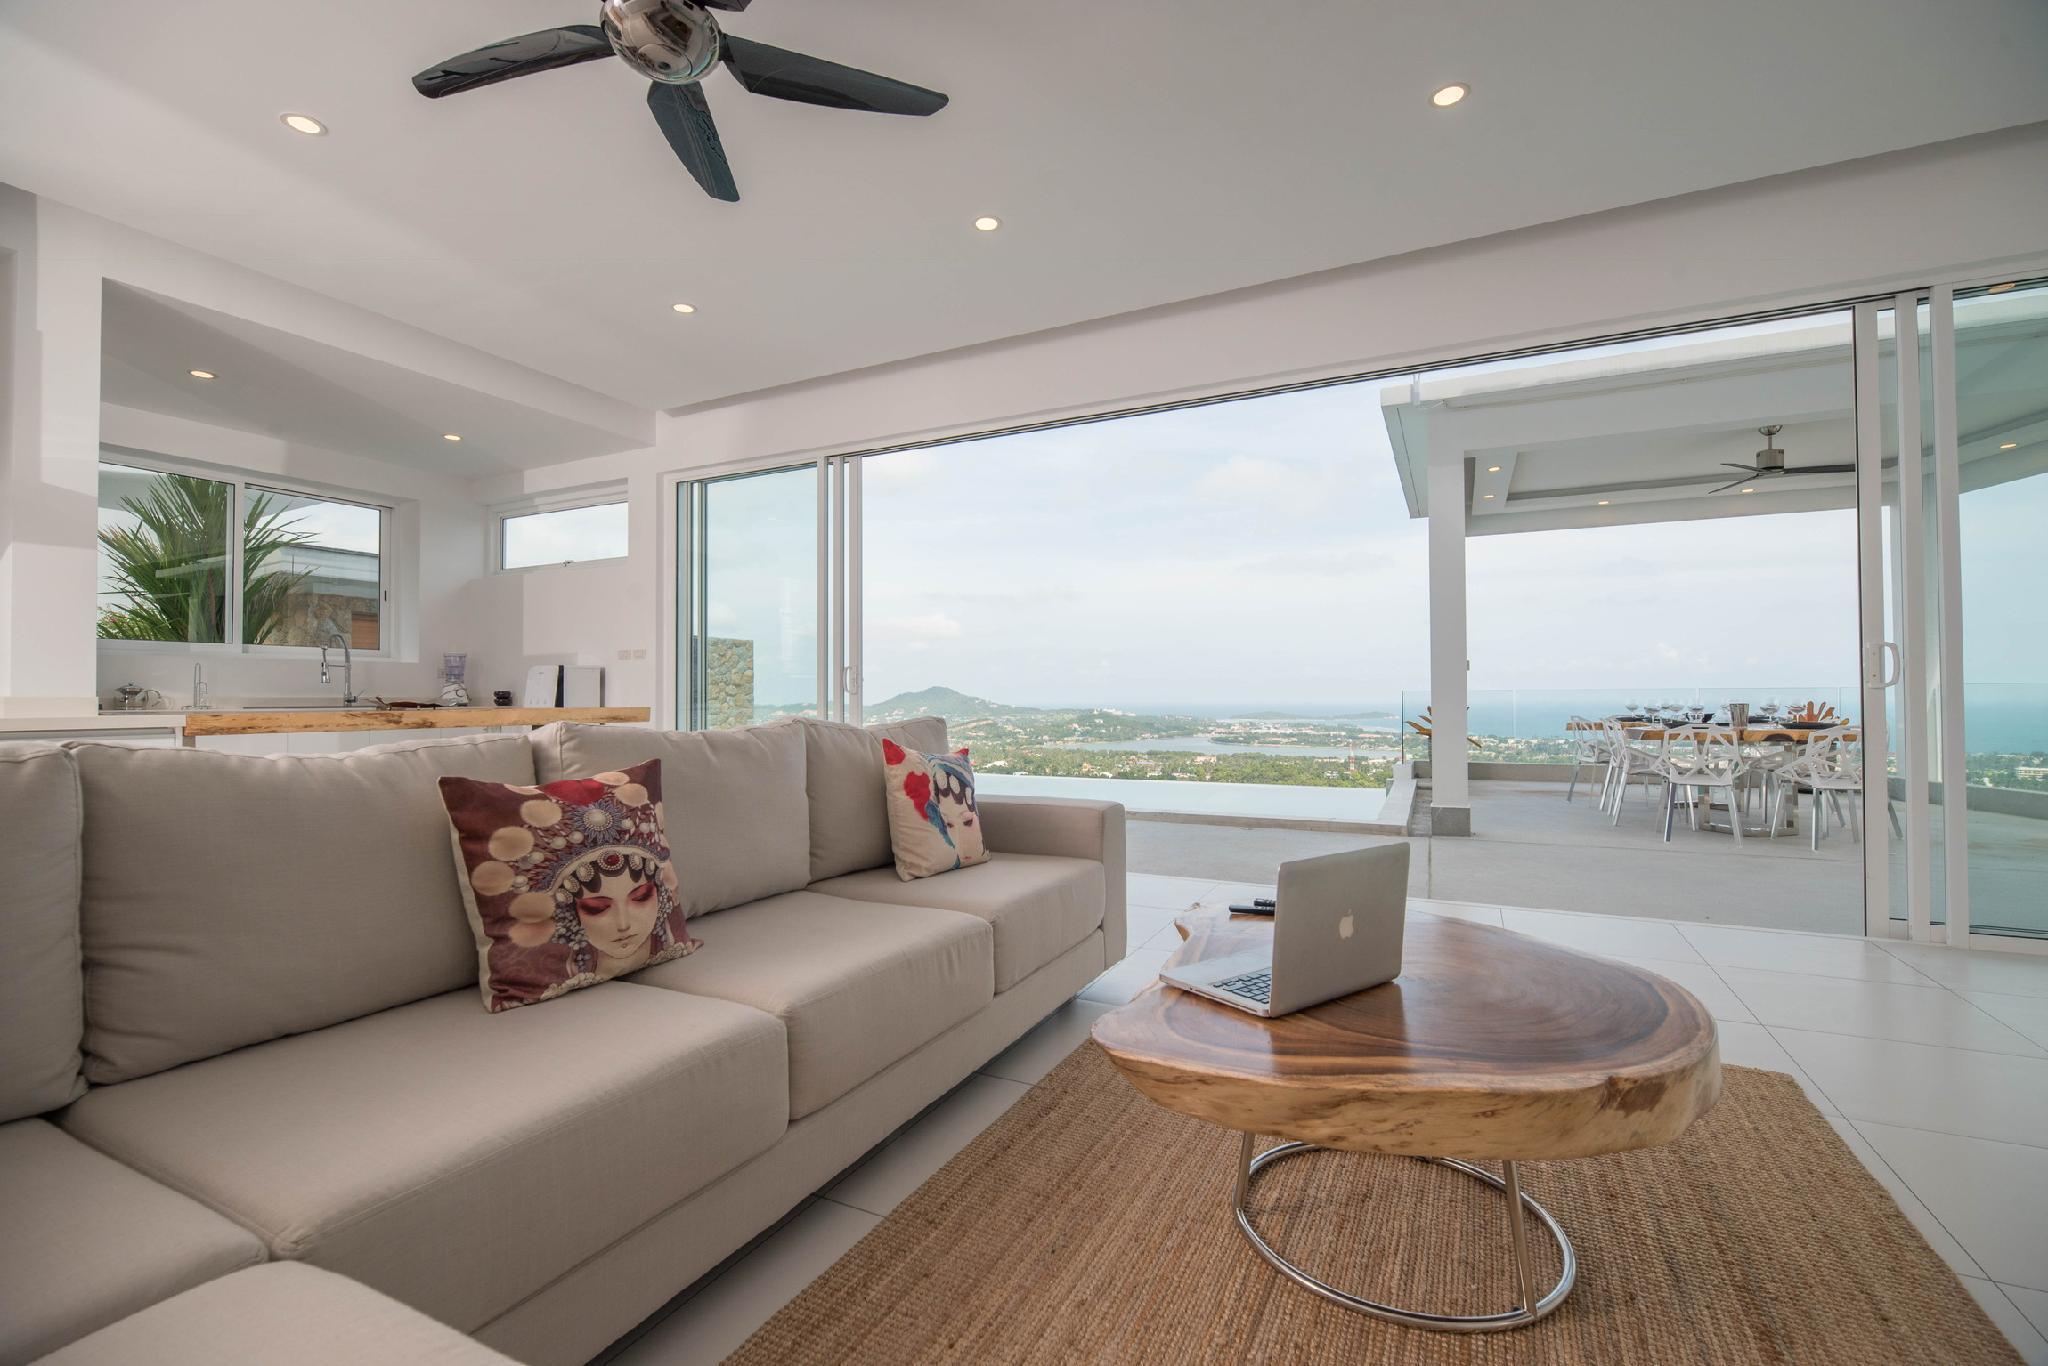 New Villa Melissa Infinity Pool Panoramic Sea View วิลลา 5 ห้องนอน 5 ห้องน้ำส่วนตัว ขนาด 315 ตร.ม. – หาดเฉวง